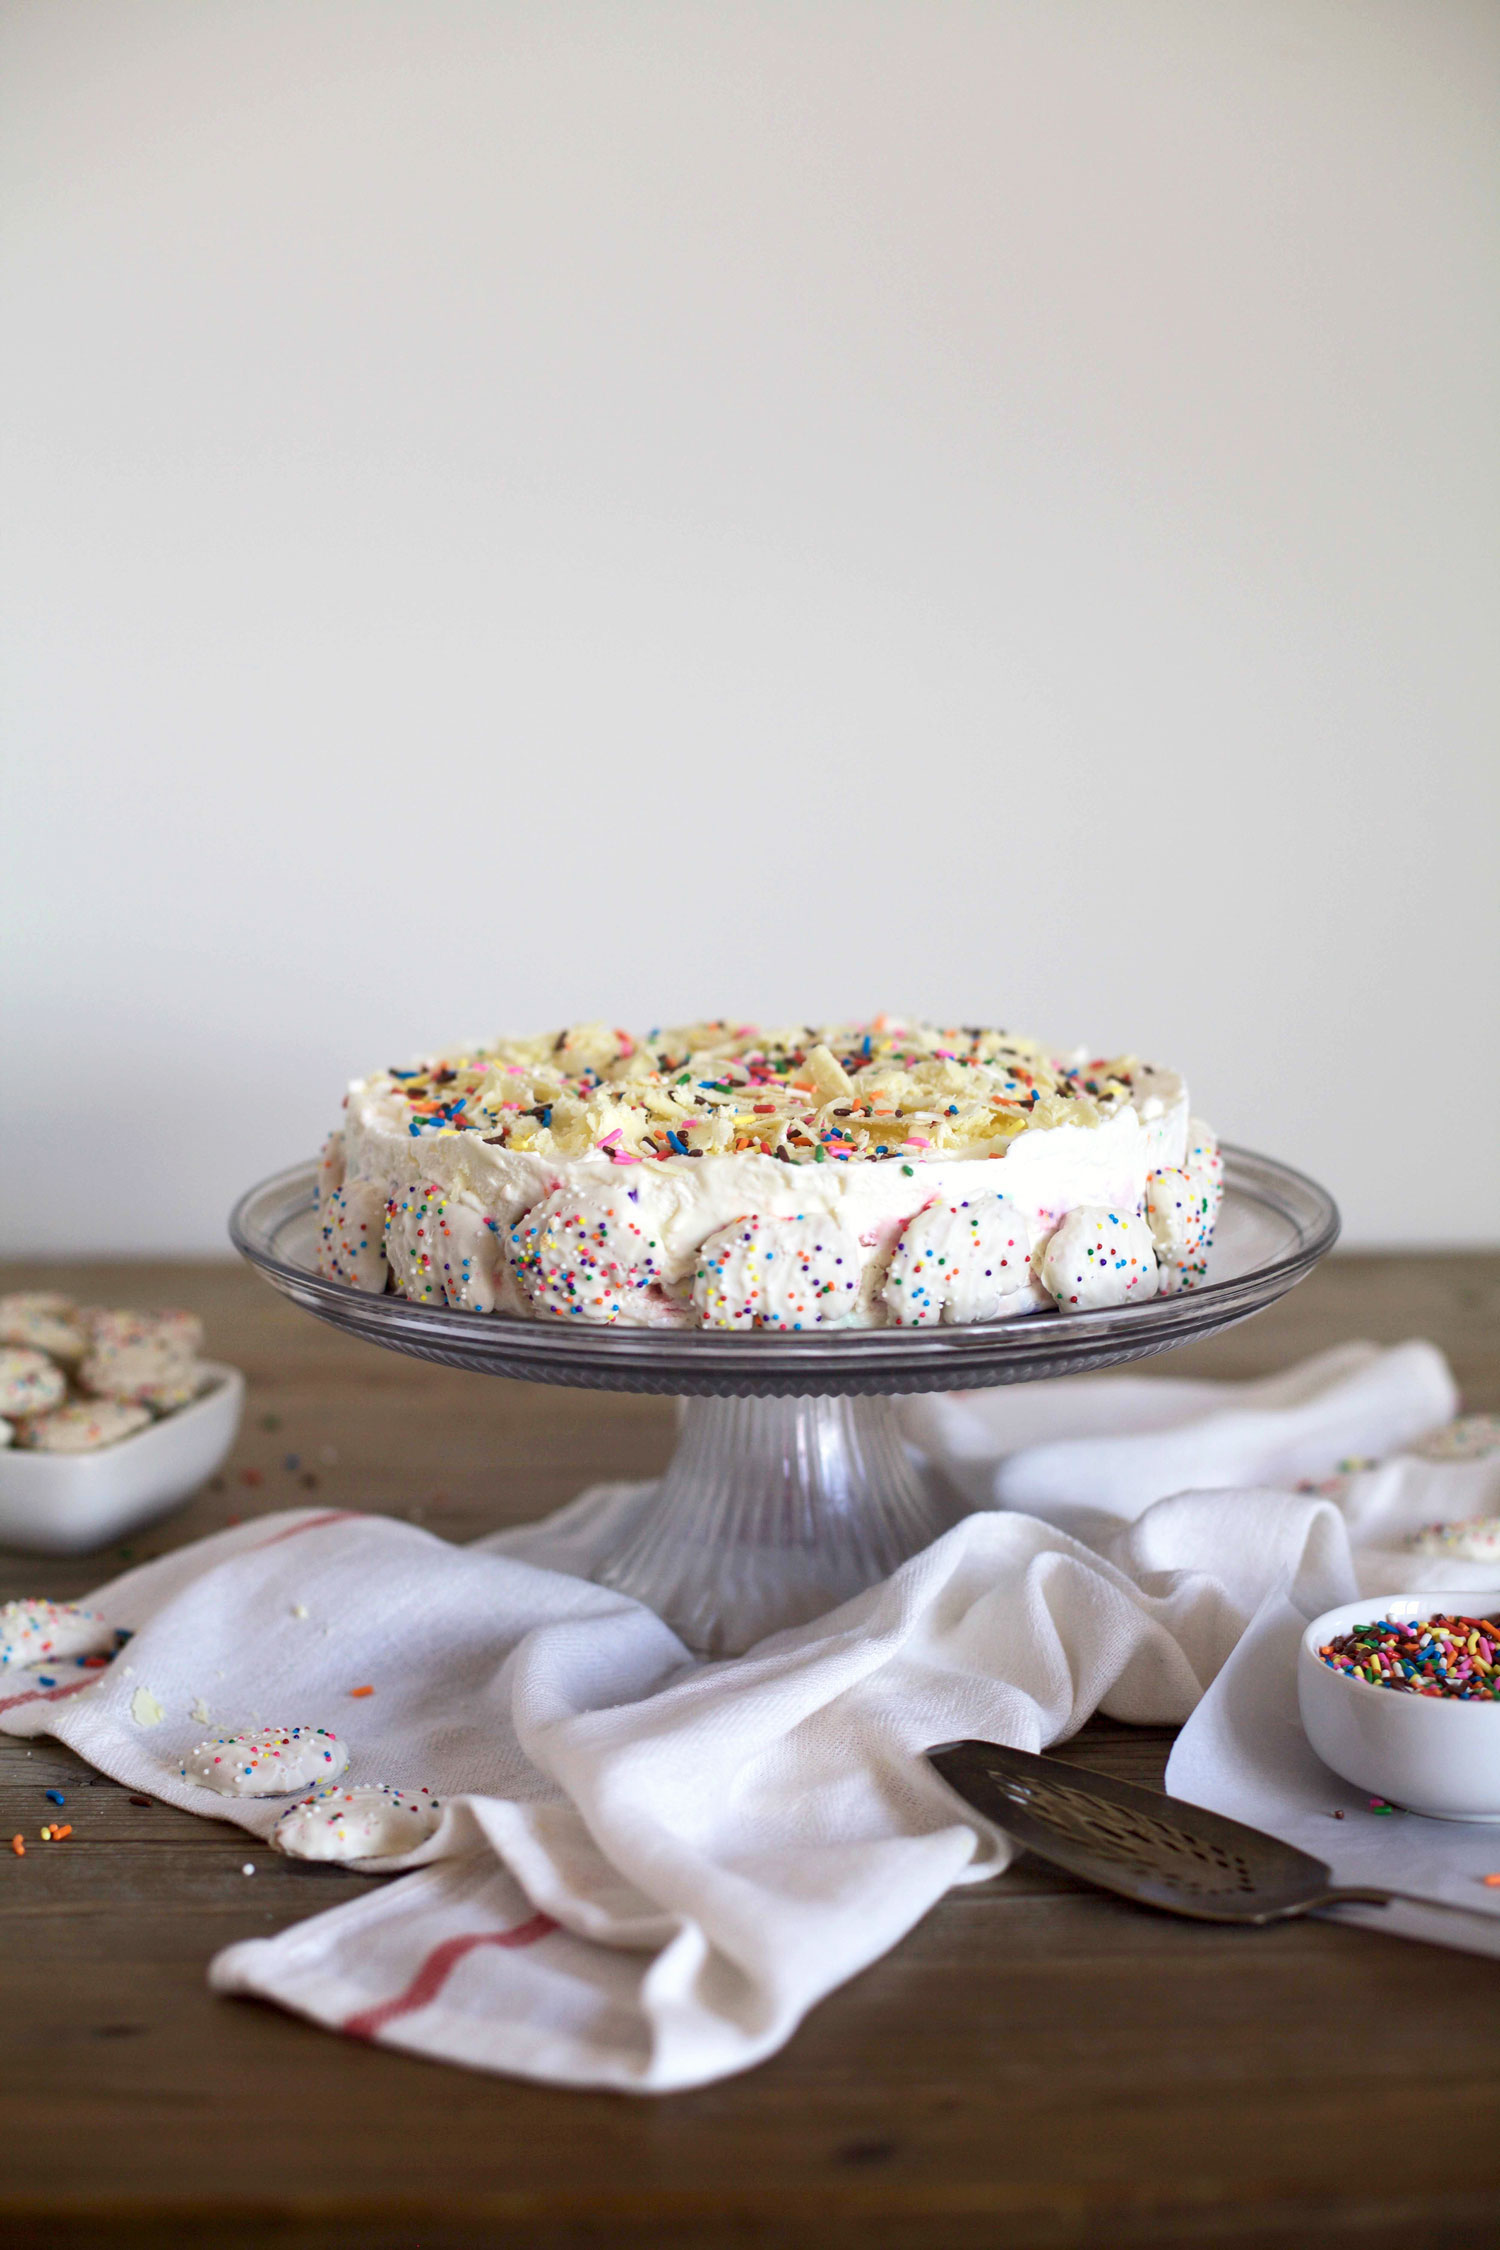 Frosted-Animal-Cracker-Ice-Box-Cake1.jpg